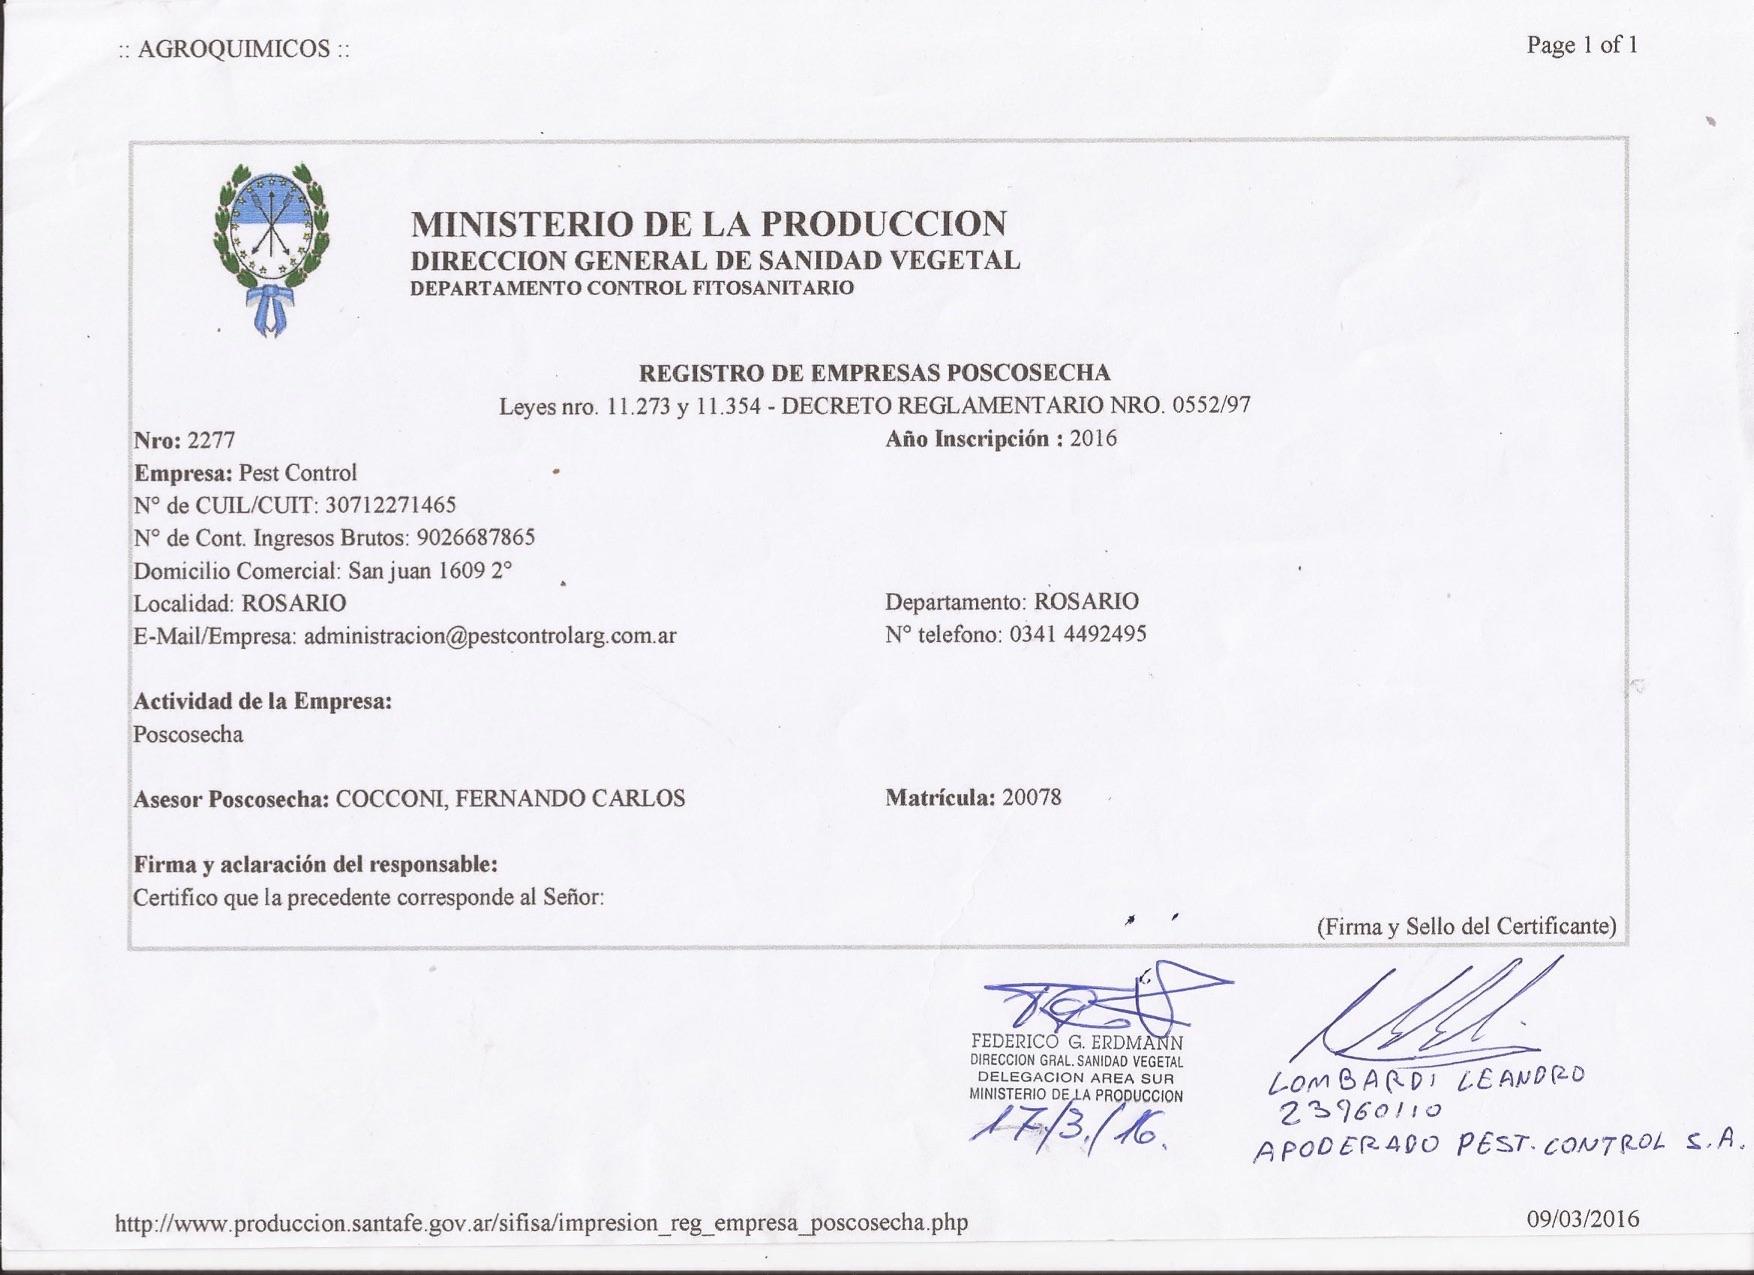 Ministerio de la producci n direcci n gral de sanidad for Ministerio produccion